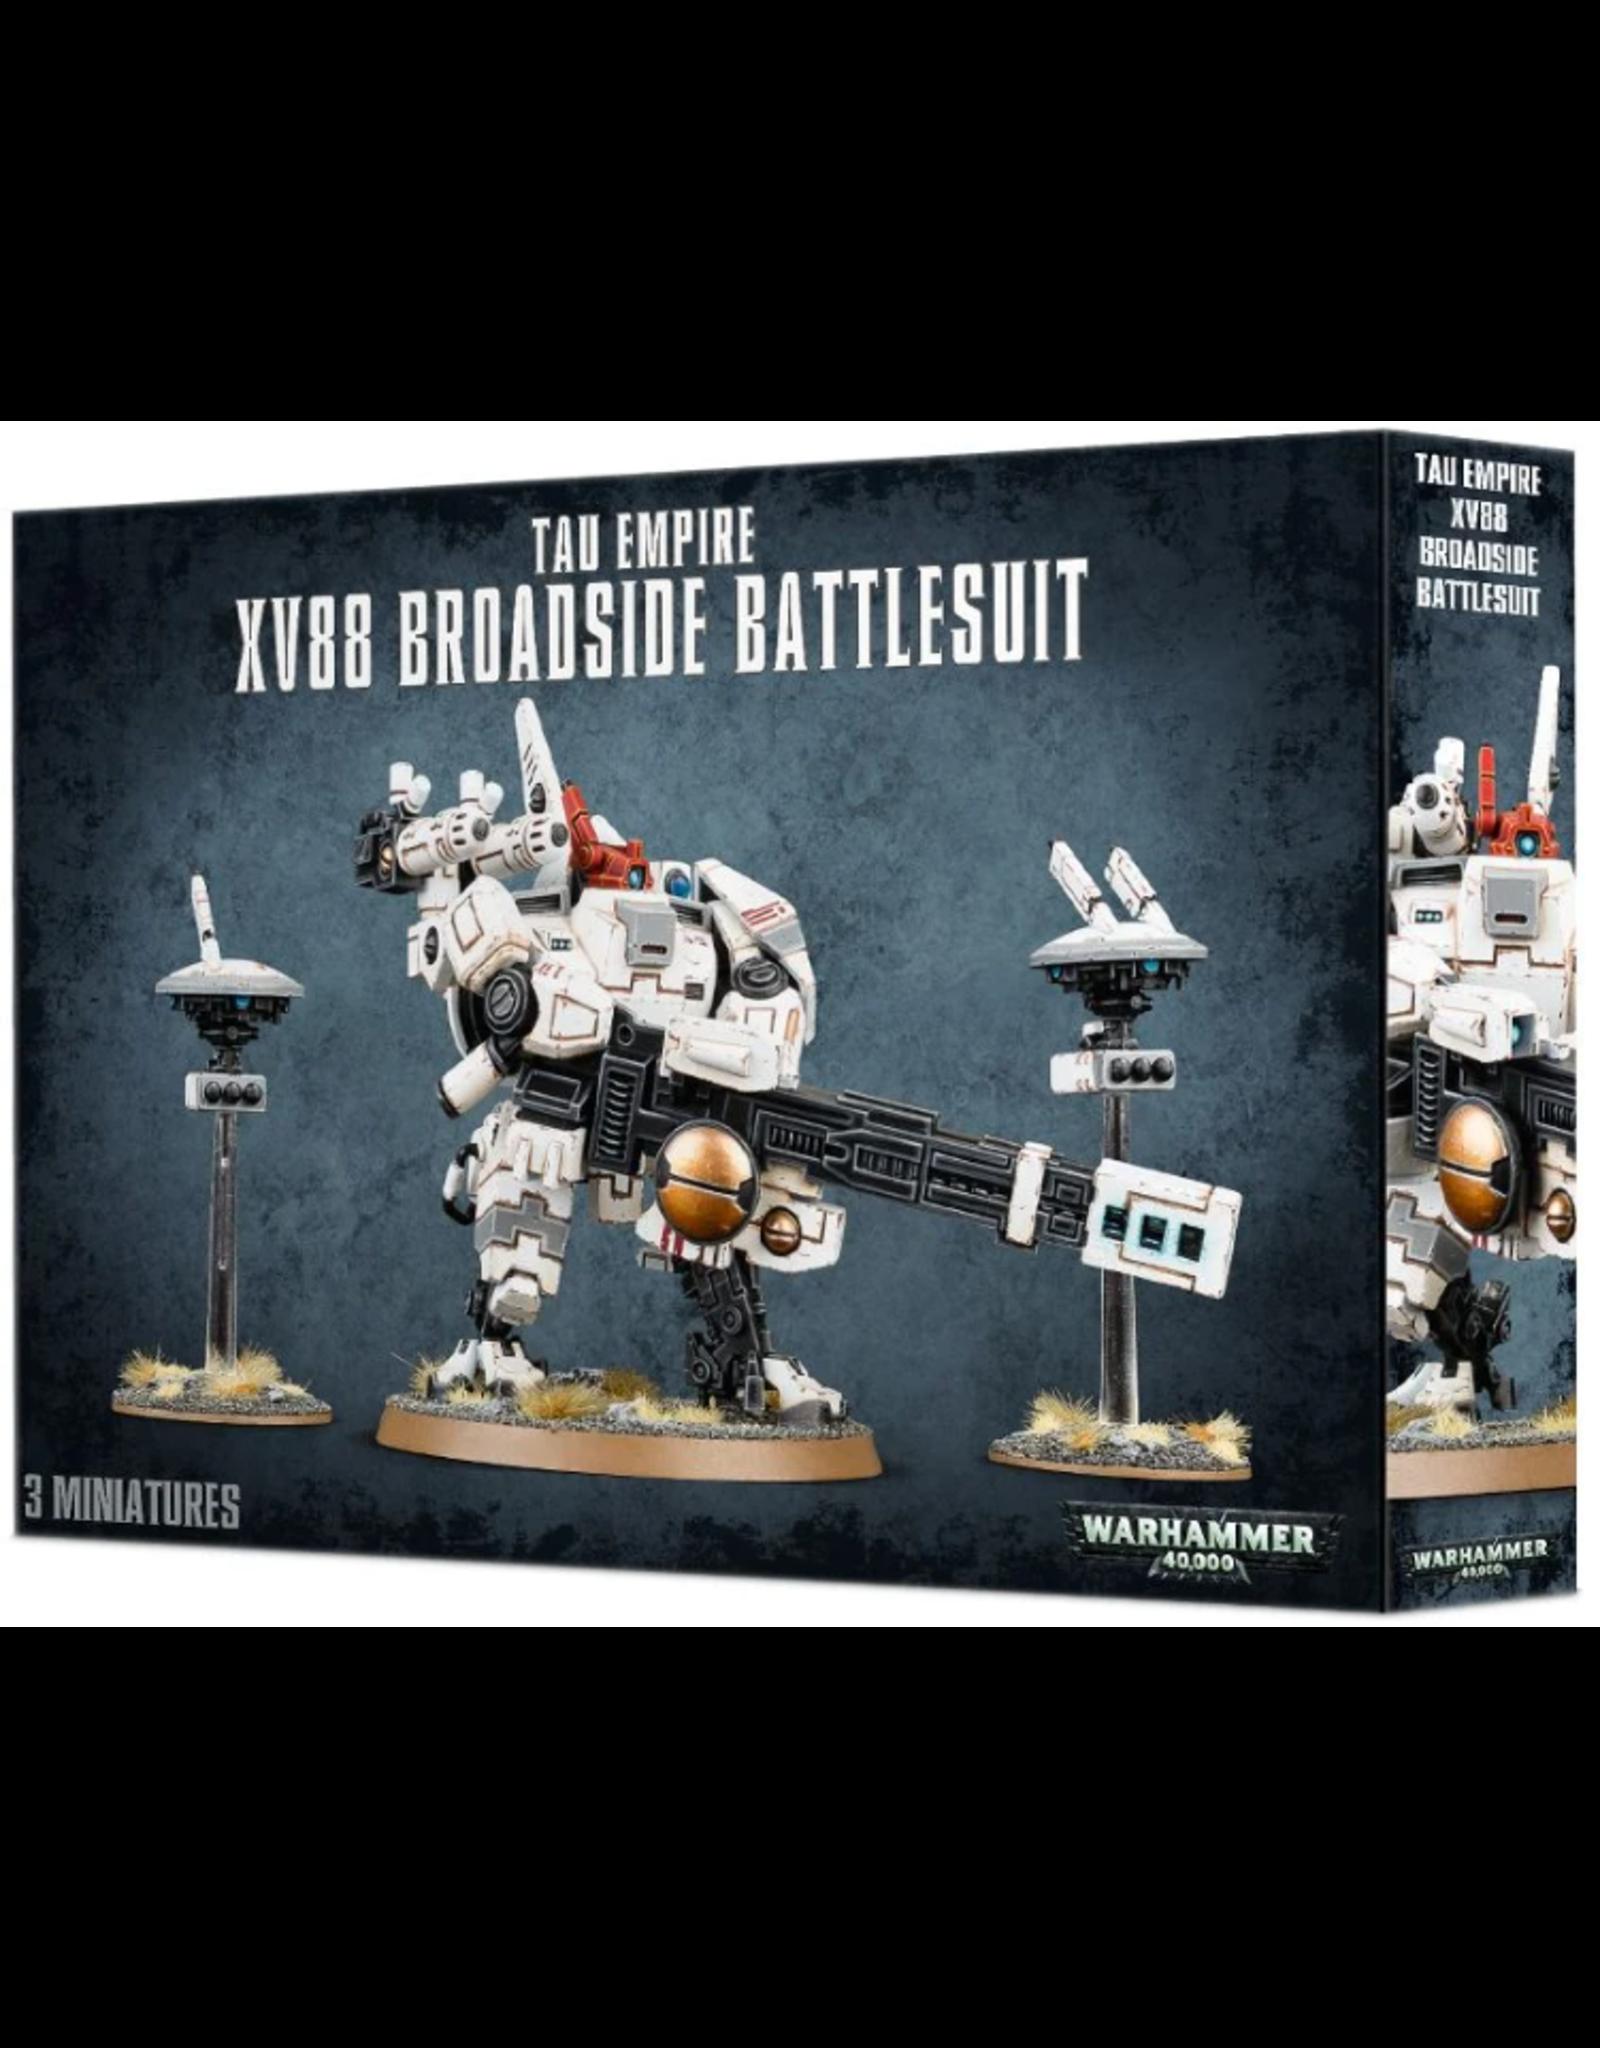 Warhammer 40K XV88 BROADSIDE BATTLESUIT